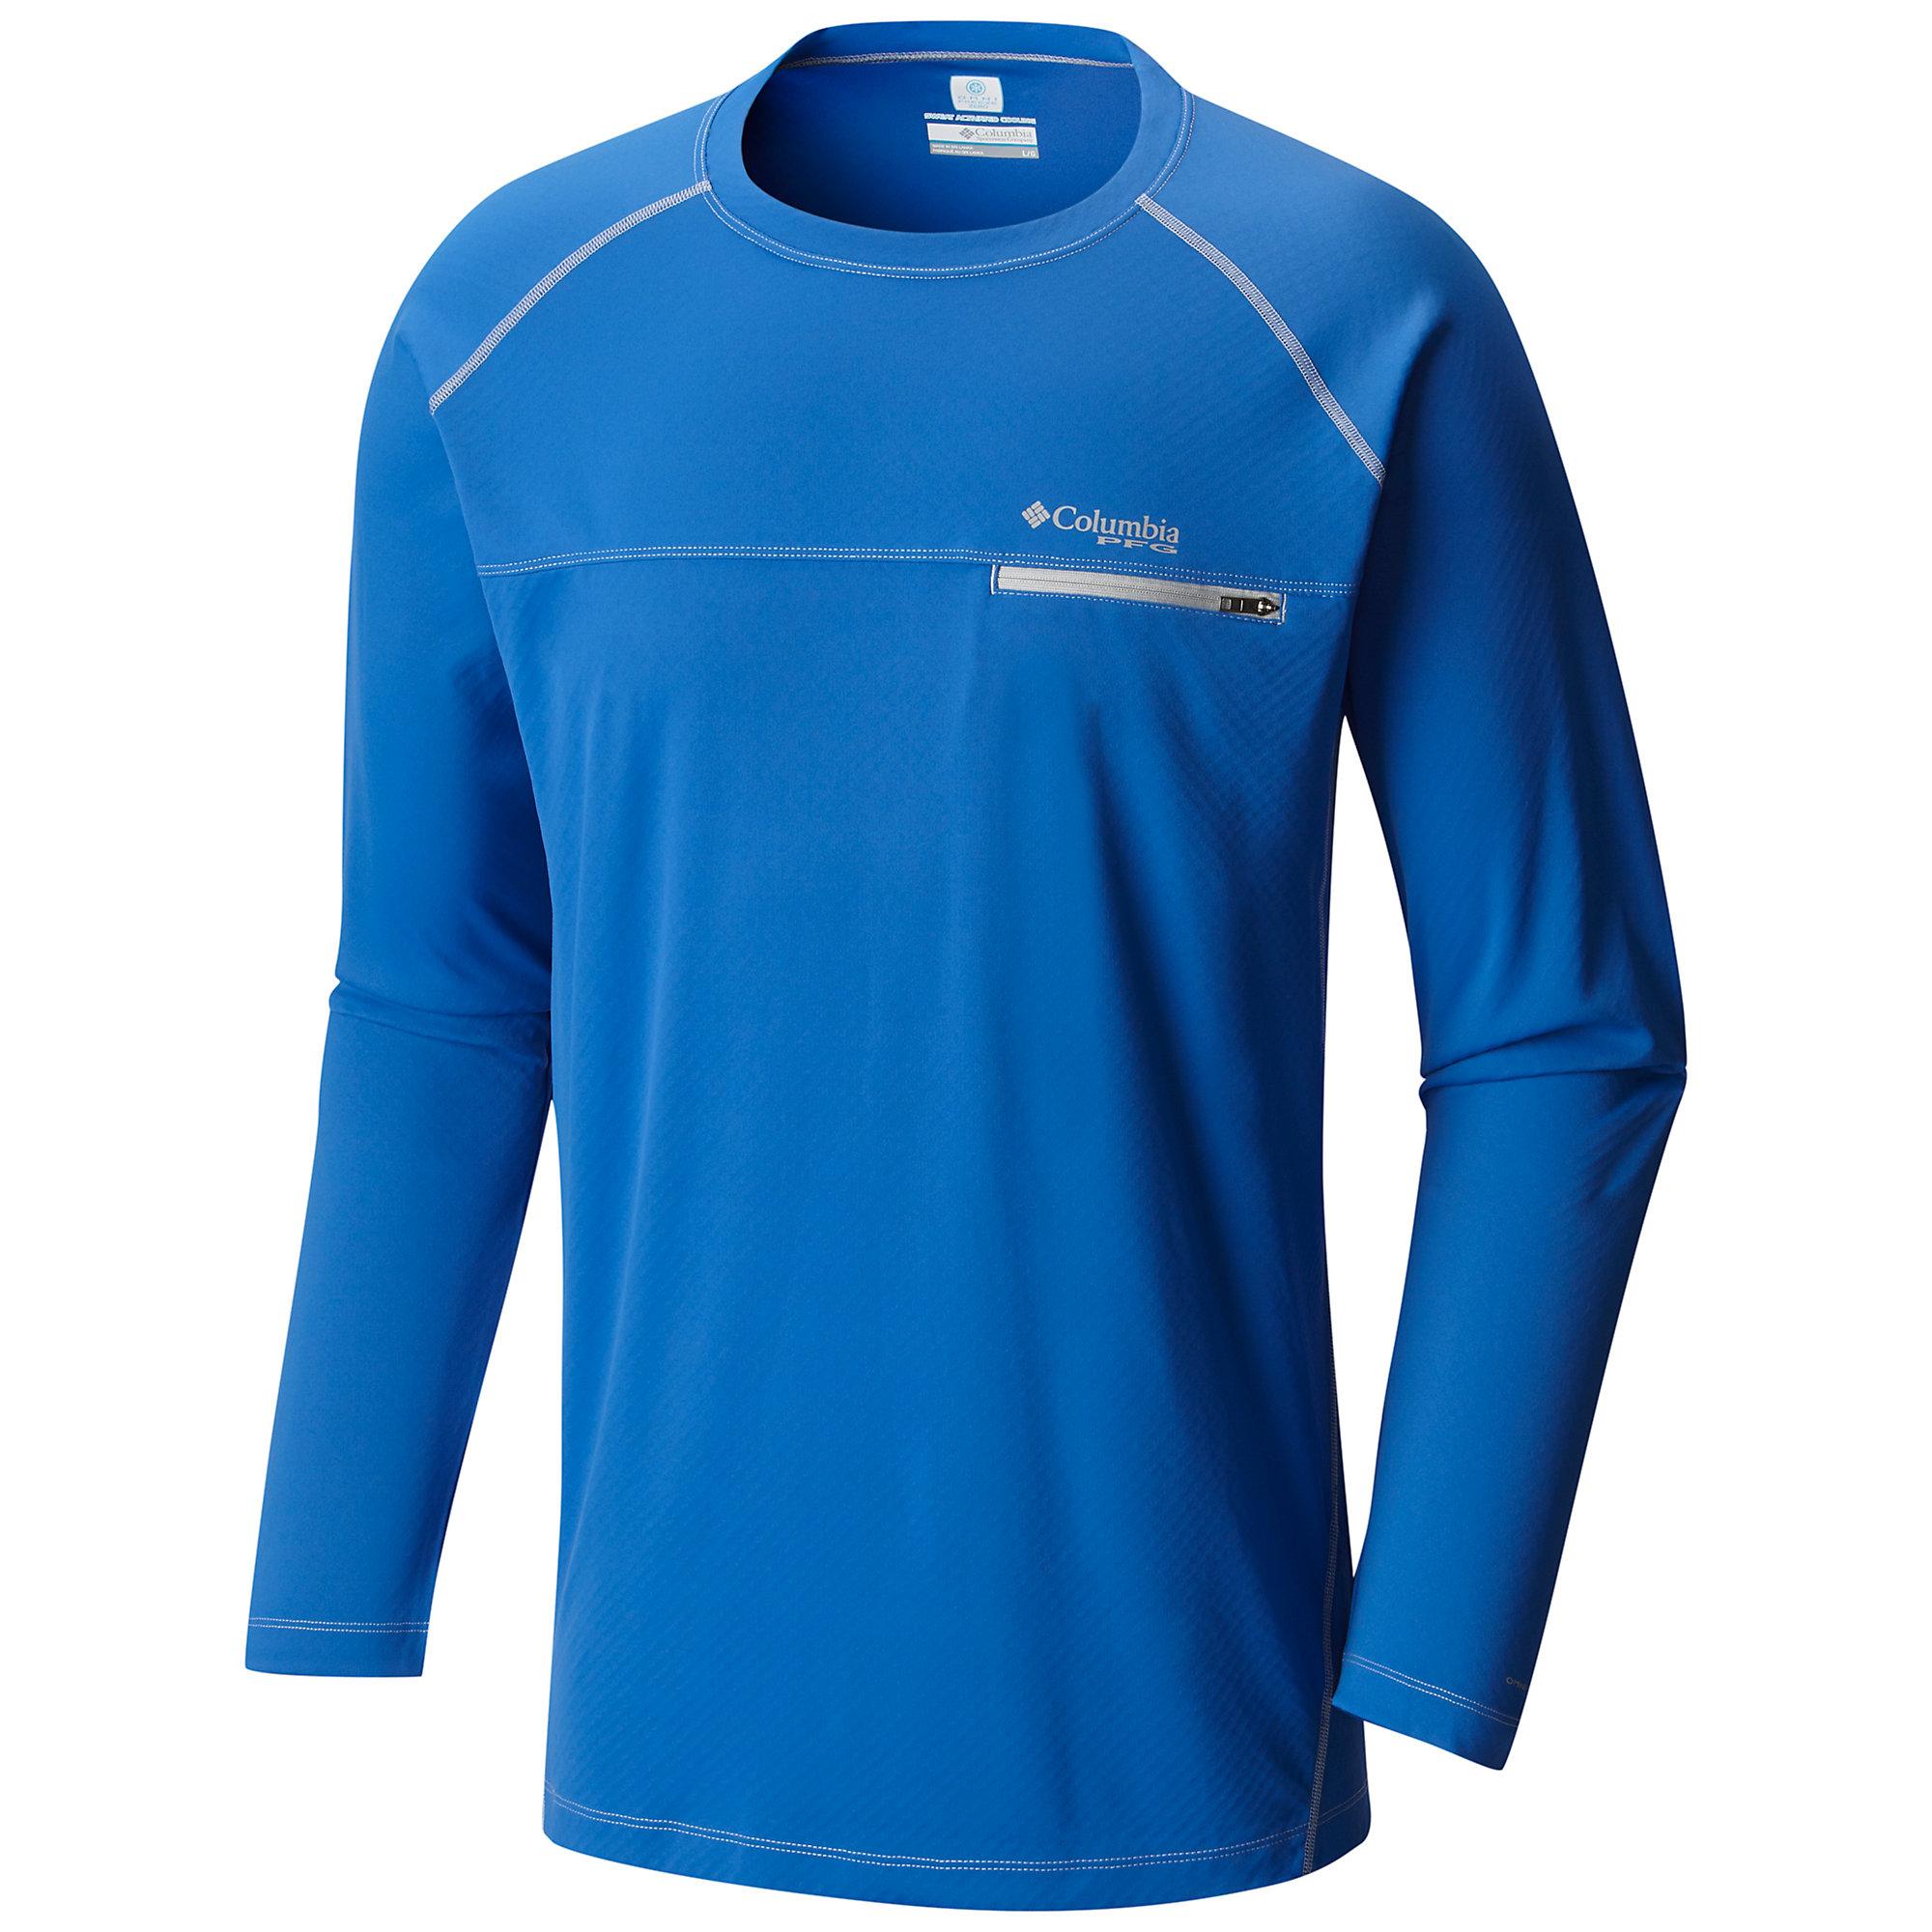 photo: Columbia PFG Cool Catch Tech ZERO Long Sleeve Shirt long sleeve performance top